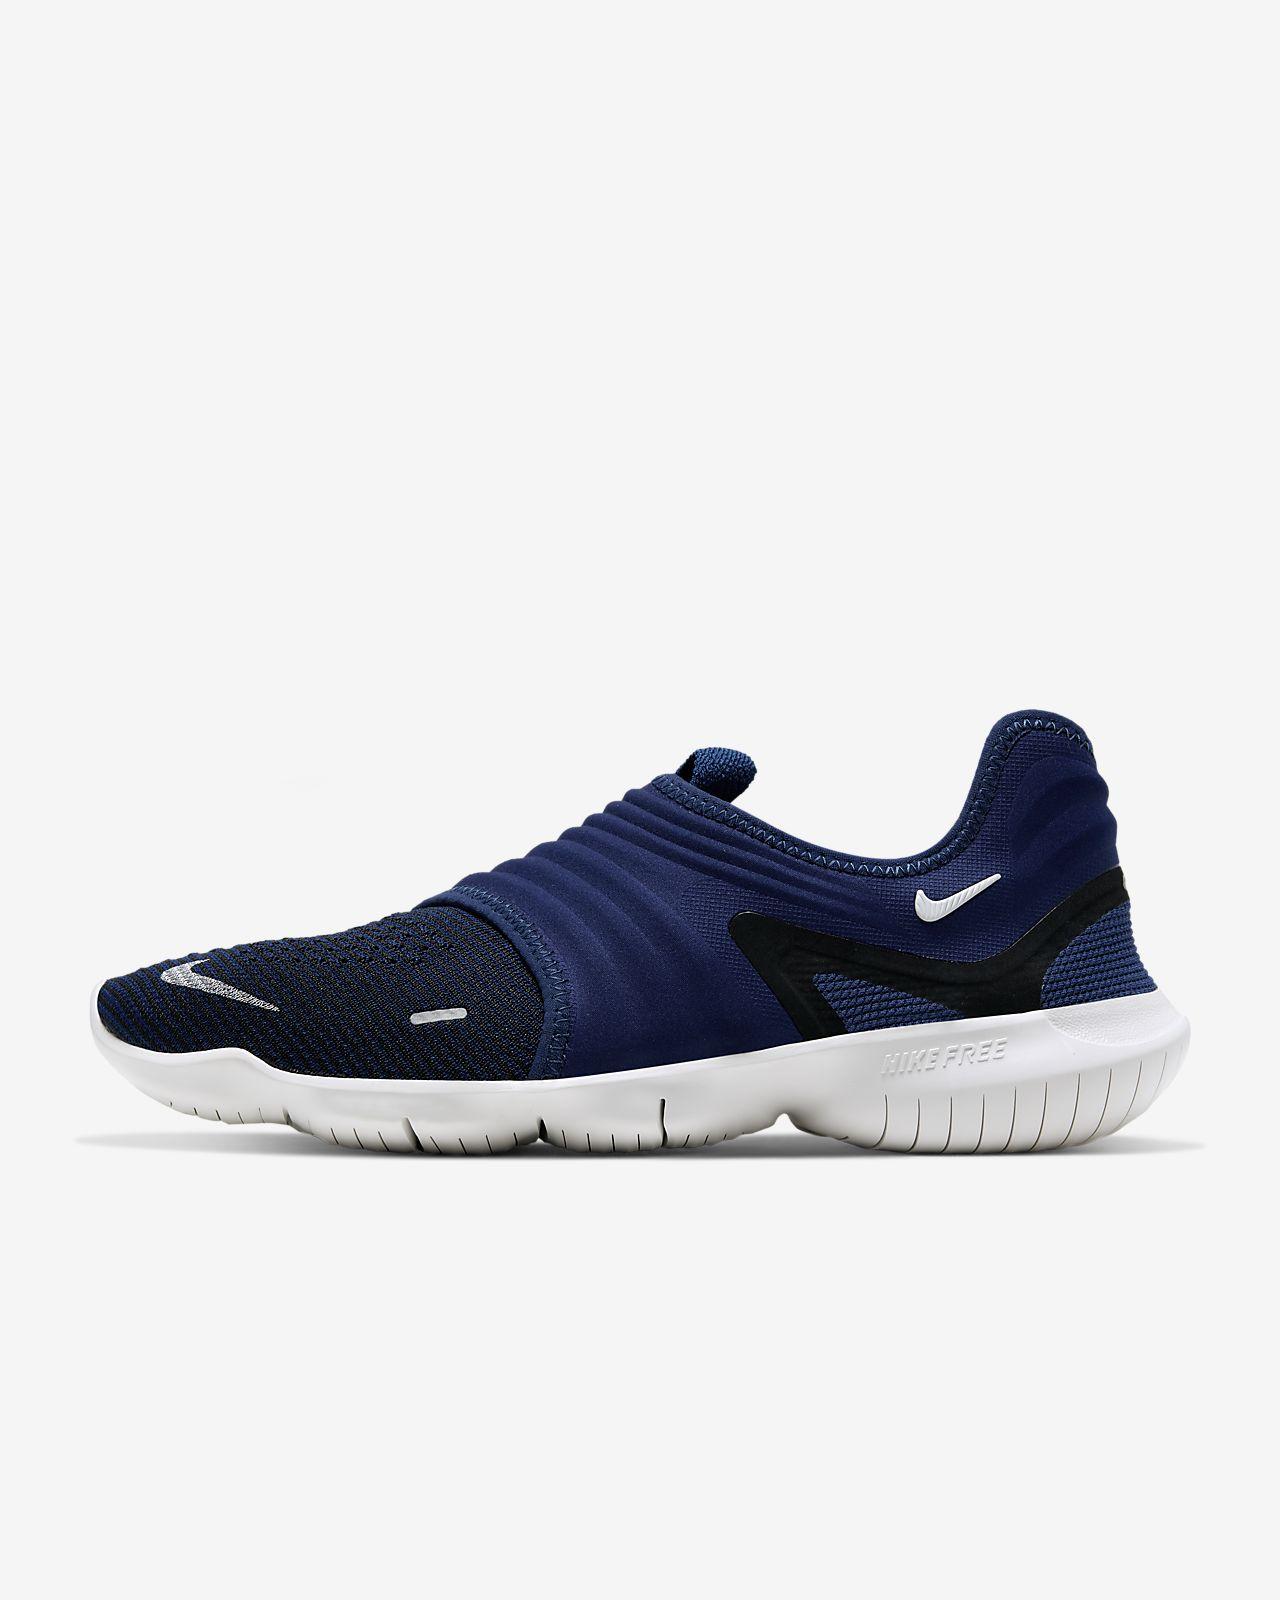 Nike Free RN Flyknit 3.0 男款跑鞋